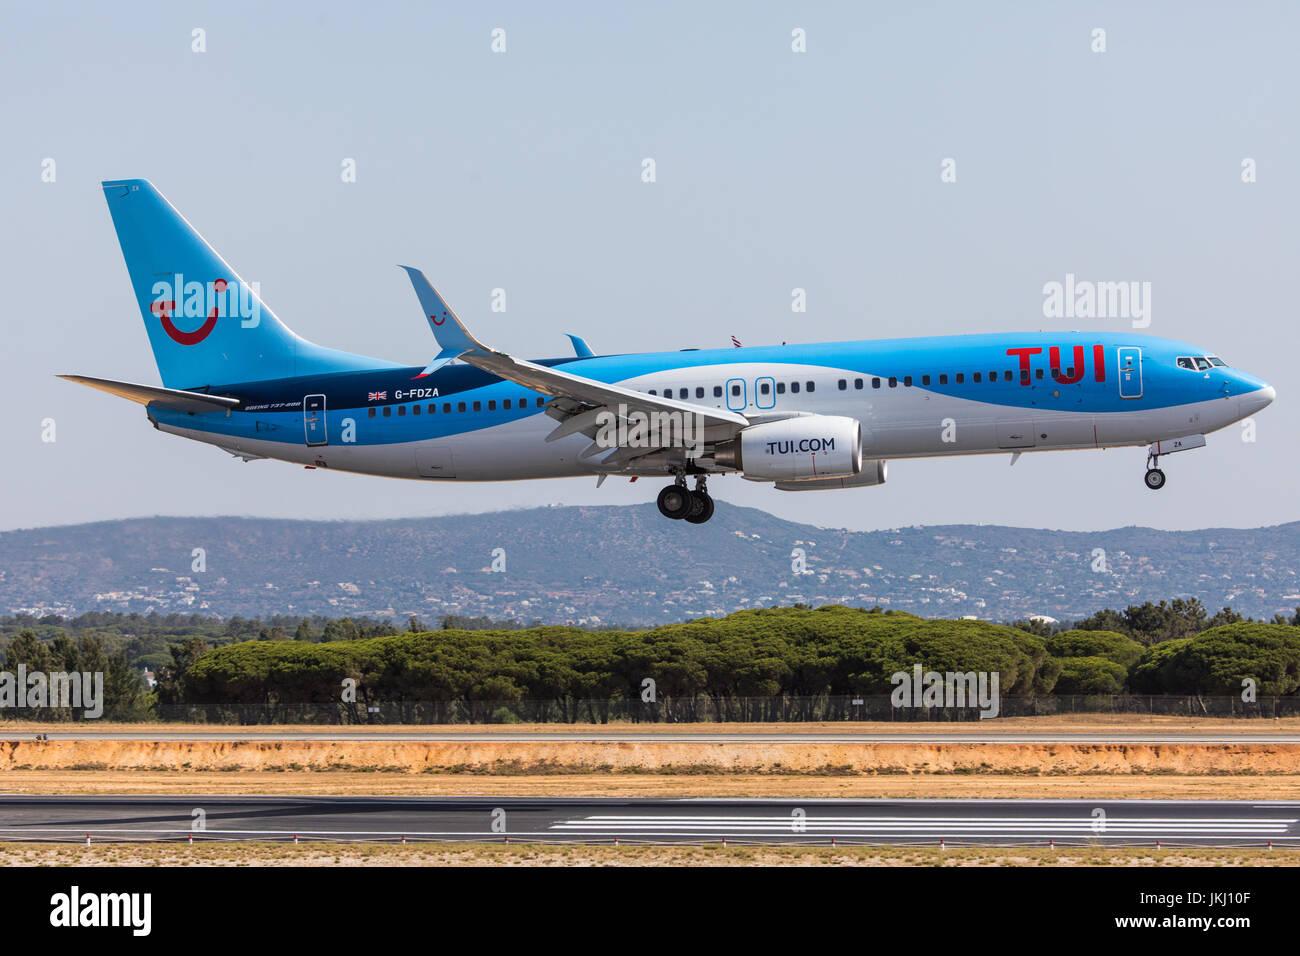 FARO, PORTUGAL - Juny 18, 2017 : Tui Flights aeroplane landing on Faro International Airport. Airport - Stock Image